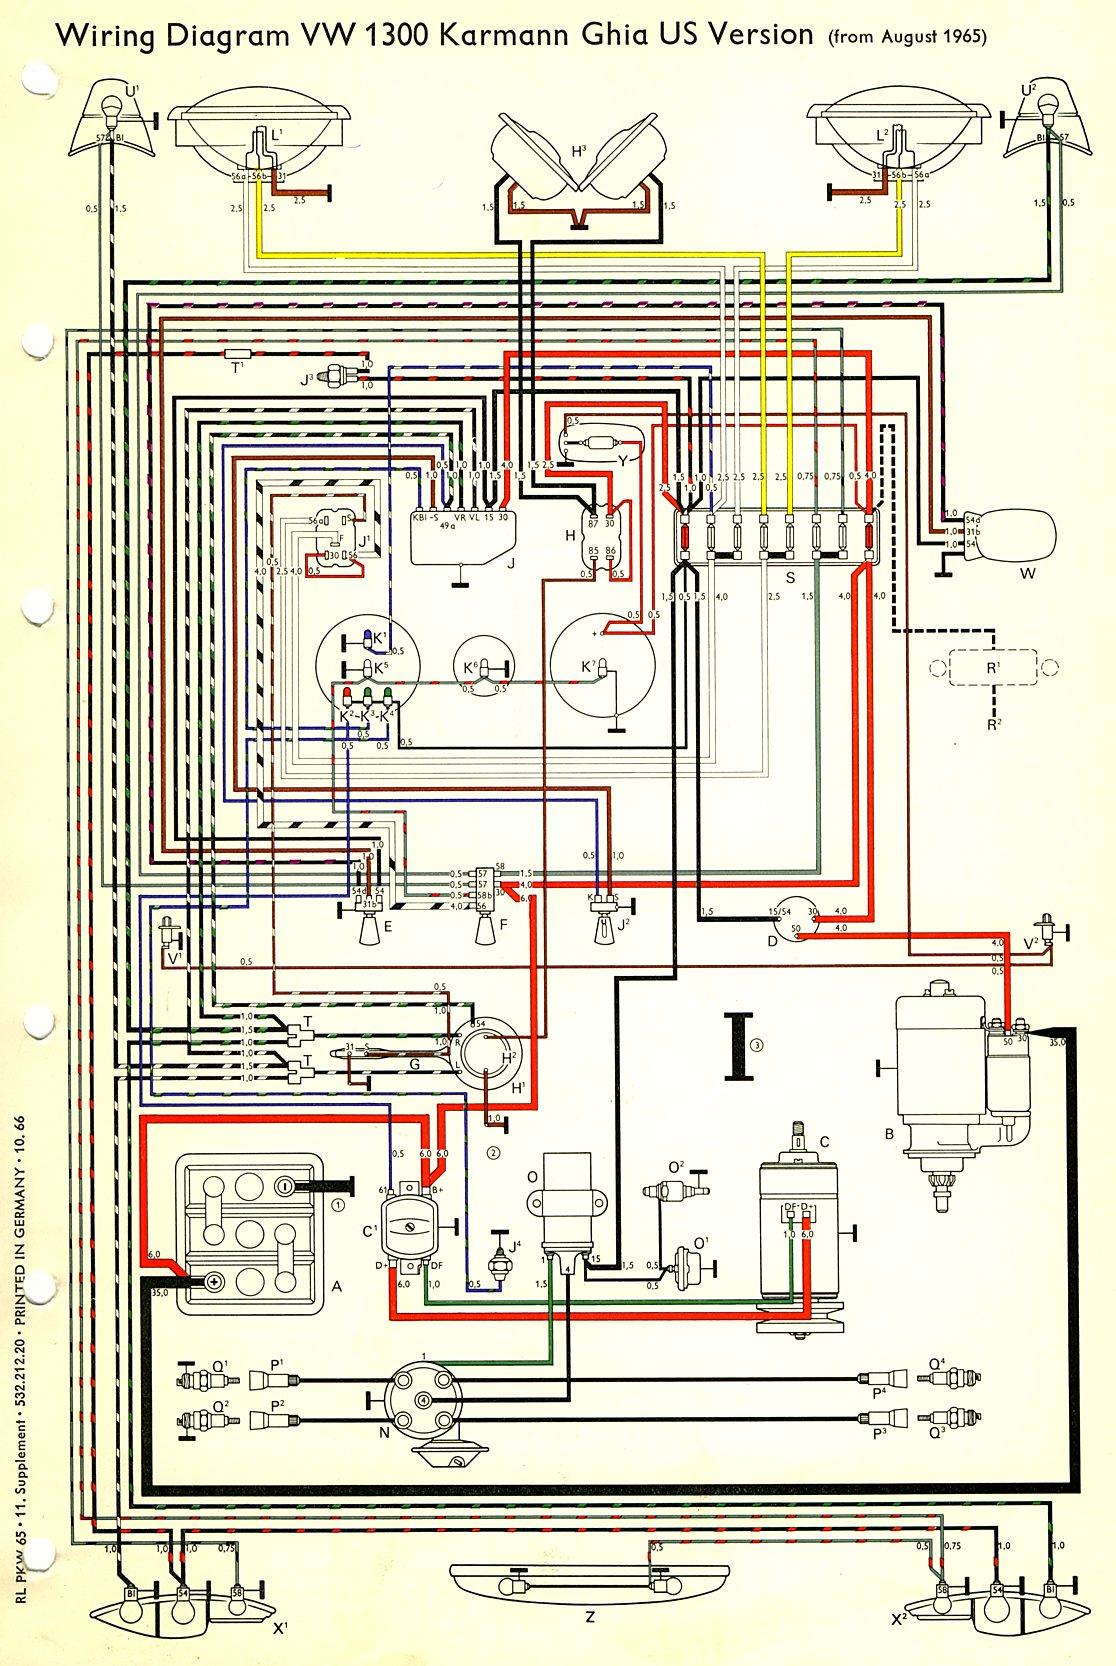 1964 Chevy Starter Wiring Diagram Thesamba Com Karmann Ghia Wiring Diagrams